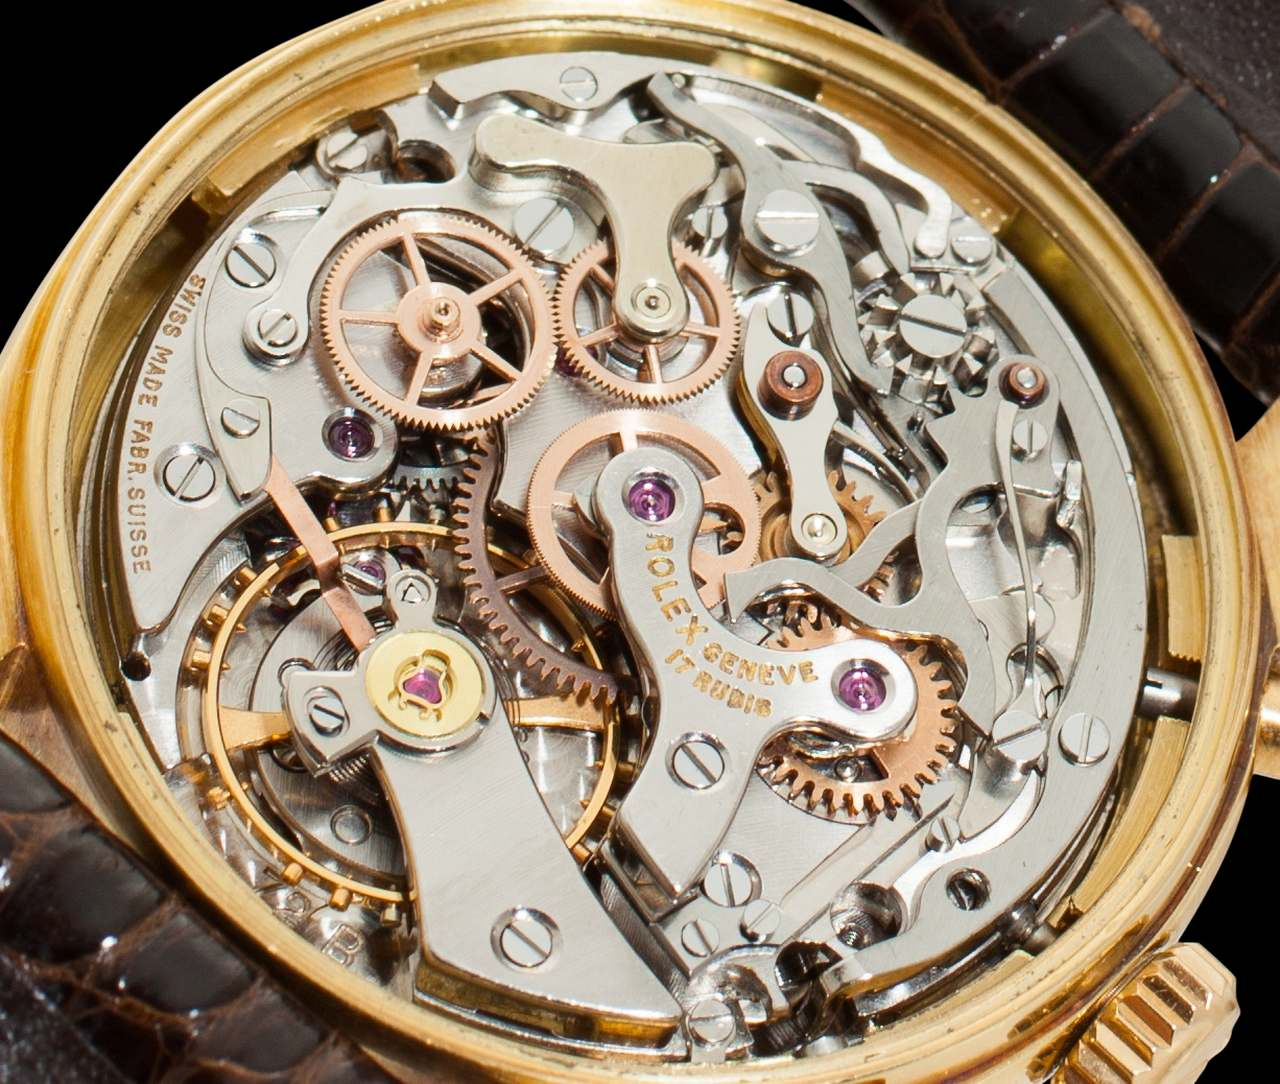 Rolex_Pre_Daytona_Ref_ 6238_Case No.996925_prezzo_price_source_bonhams5